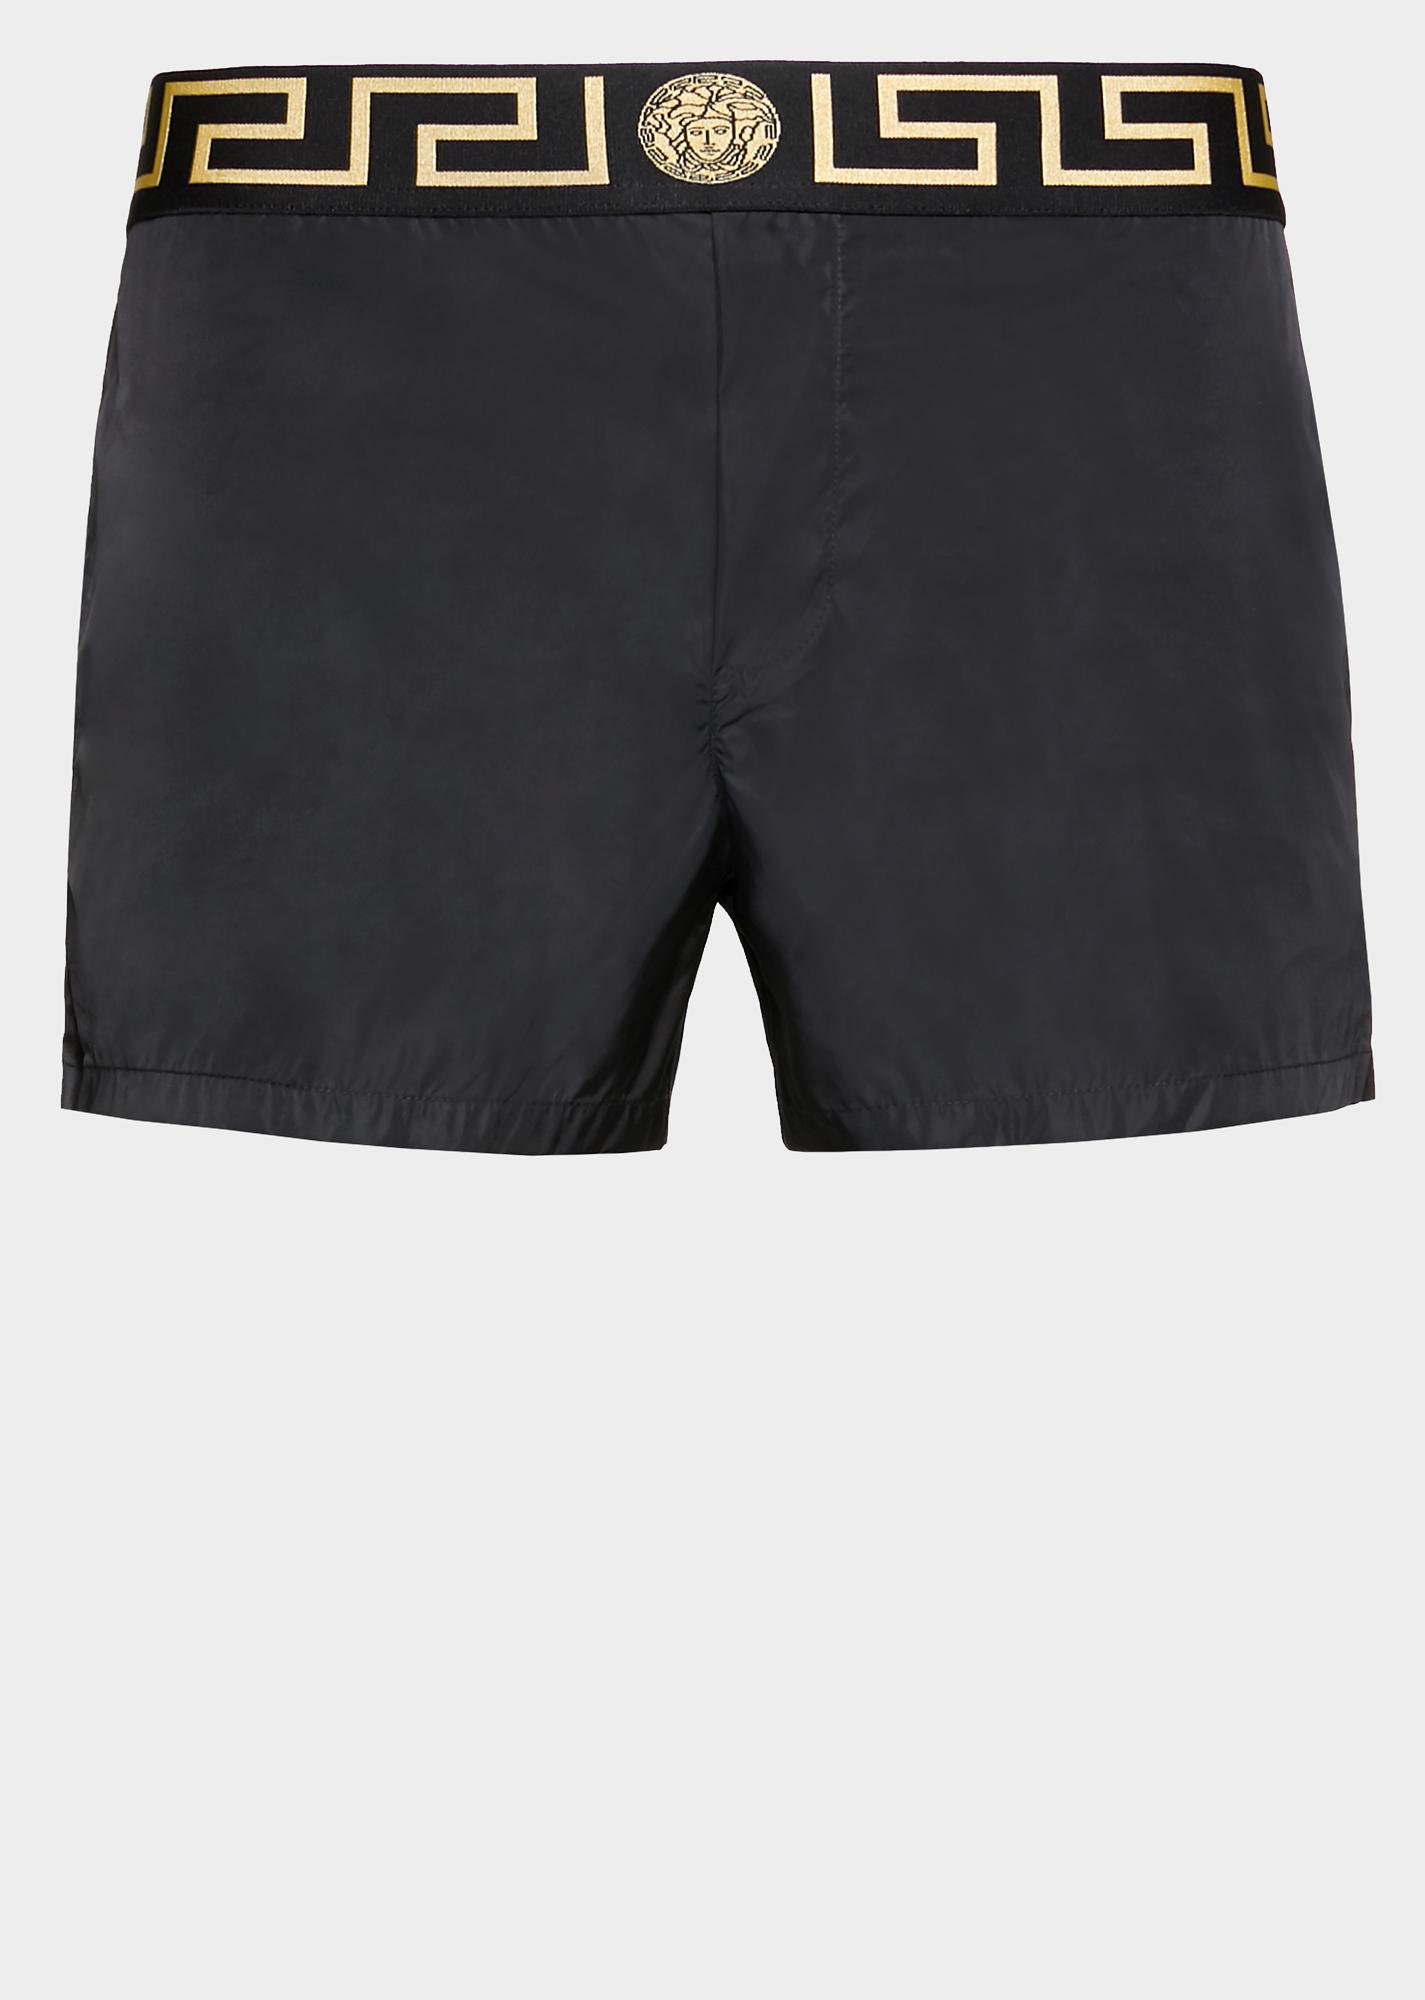 d3988a7c7e VERSACE Medusa and Greek Key swim shorts. #versace #cloth | Versace ...